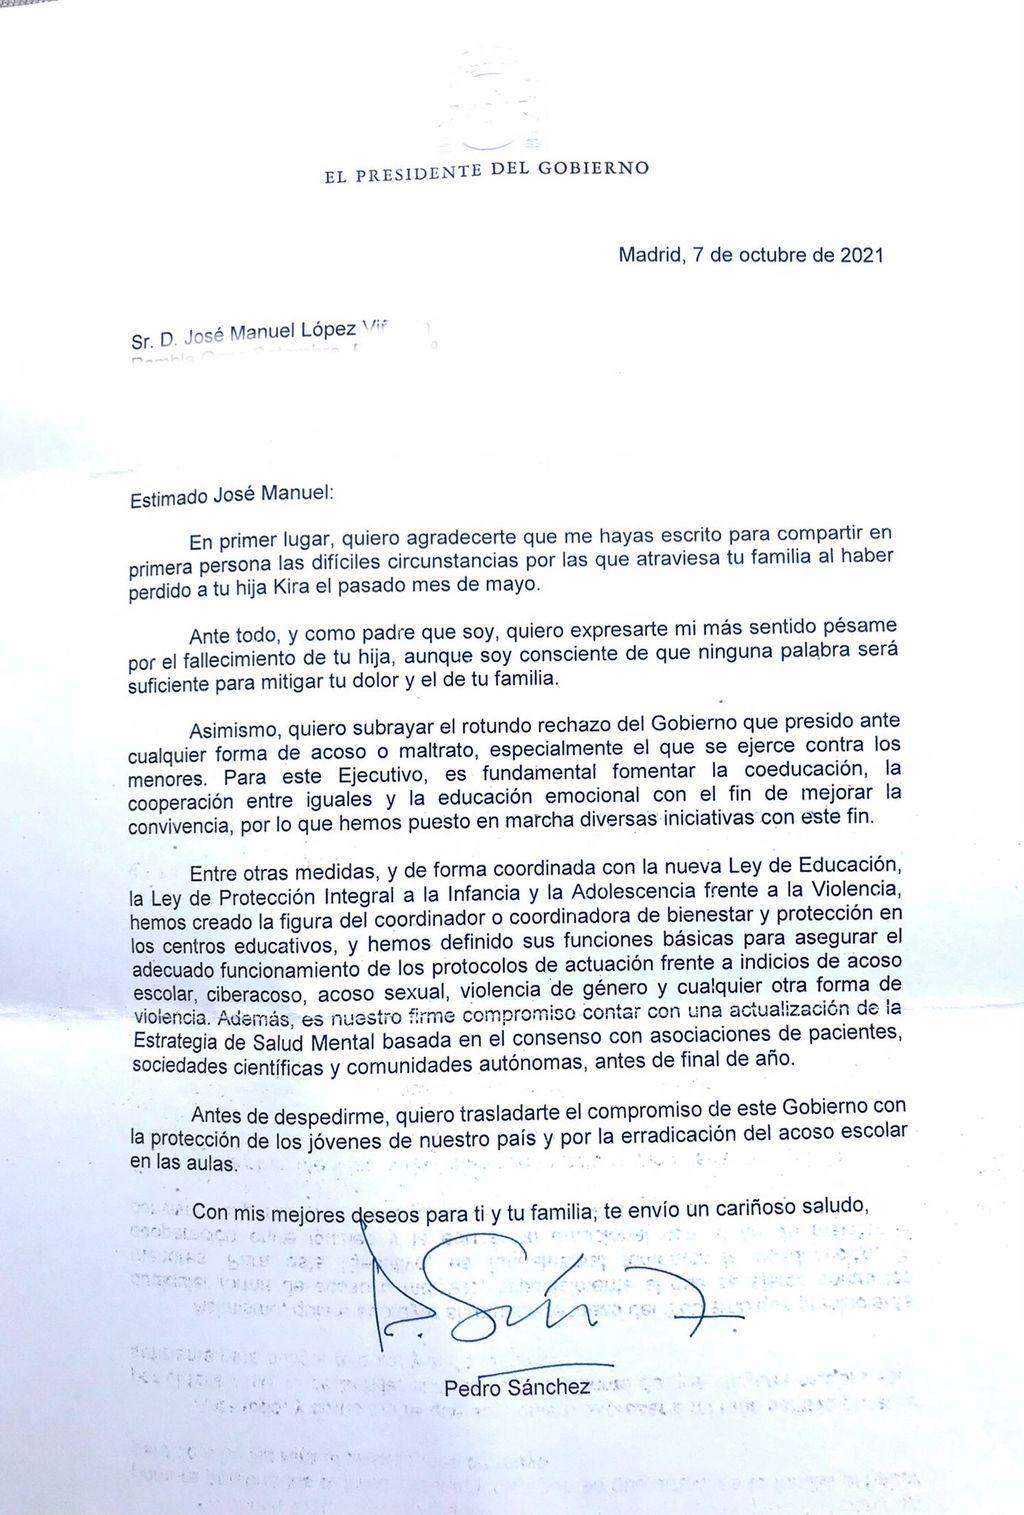 Carta Pedro Sánchez padres de Kira